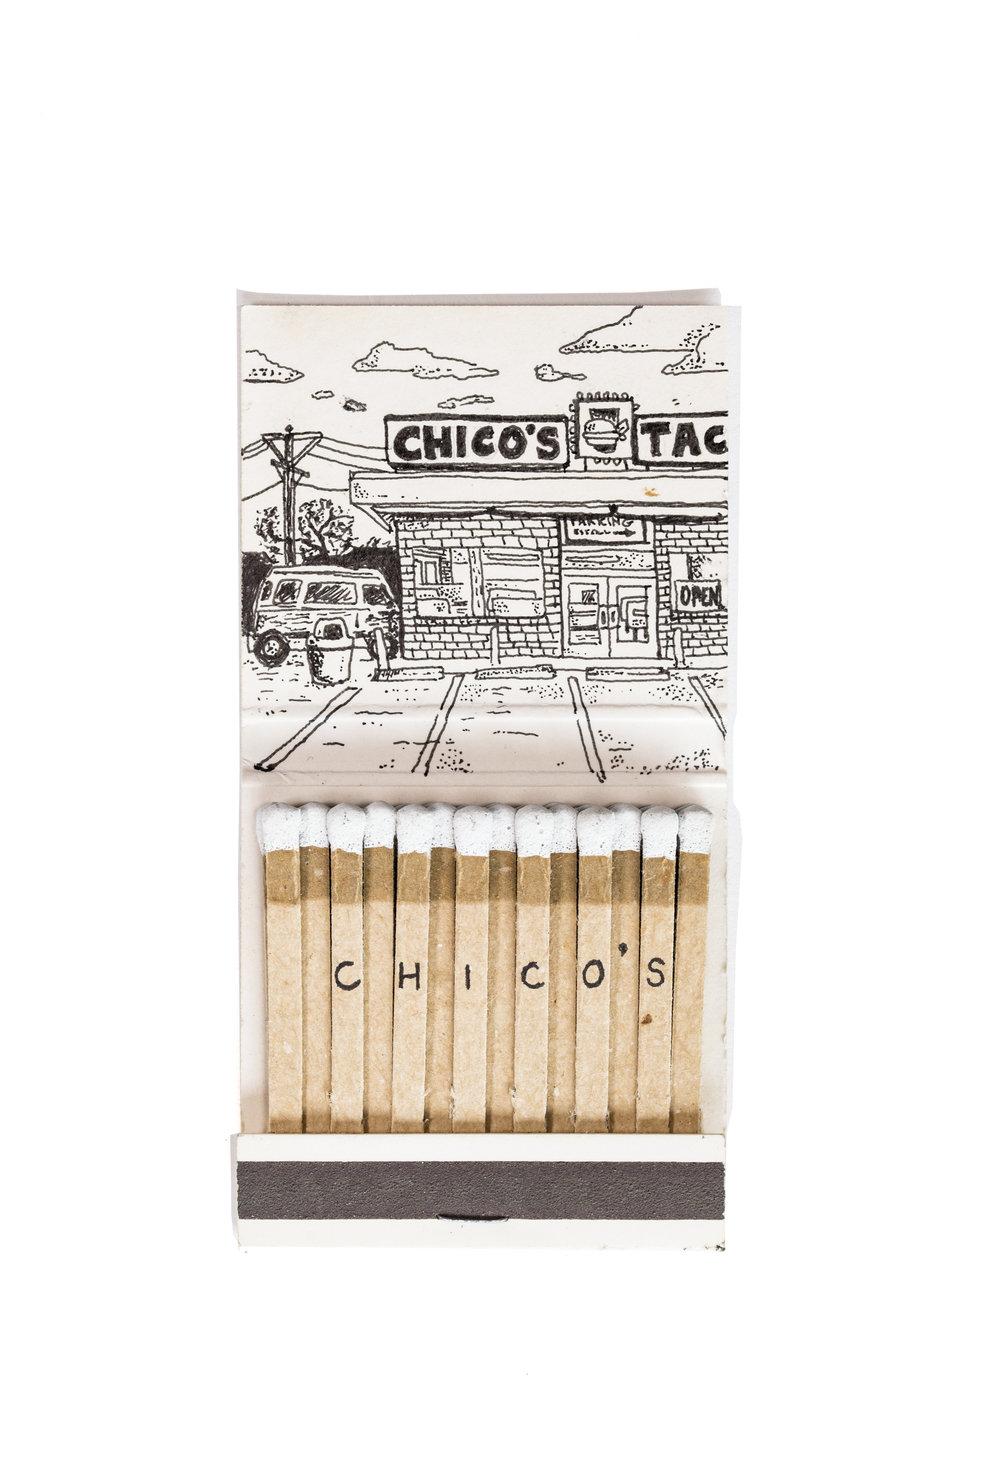 11. Chico's Tacos